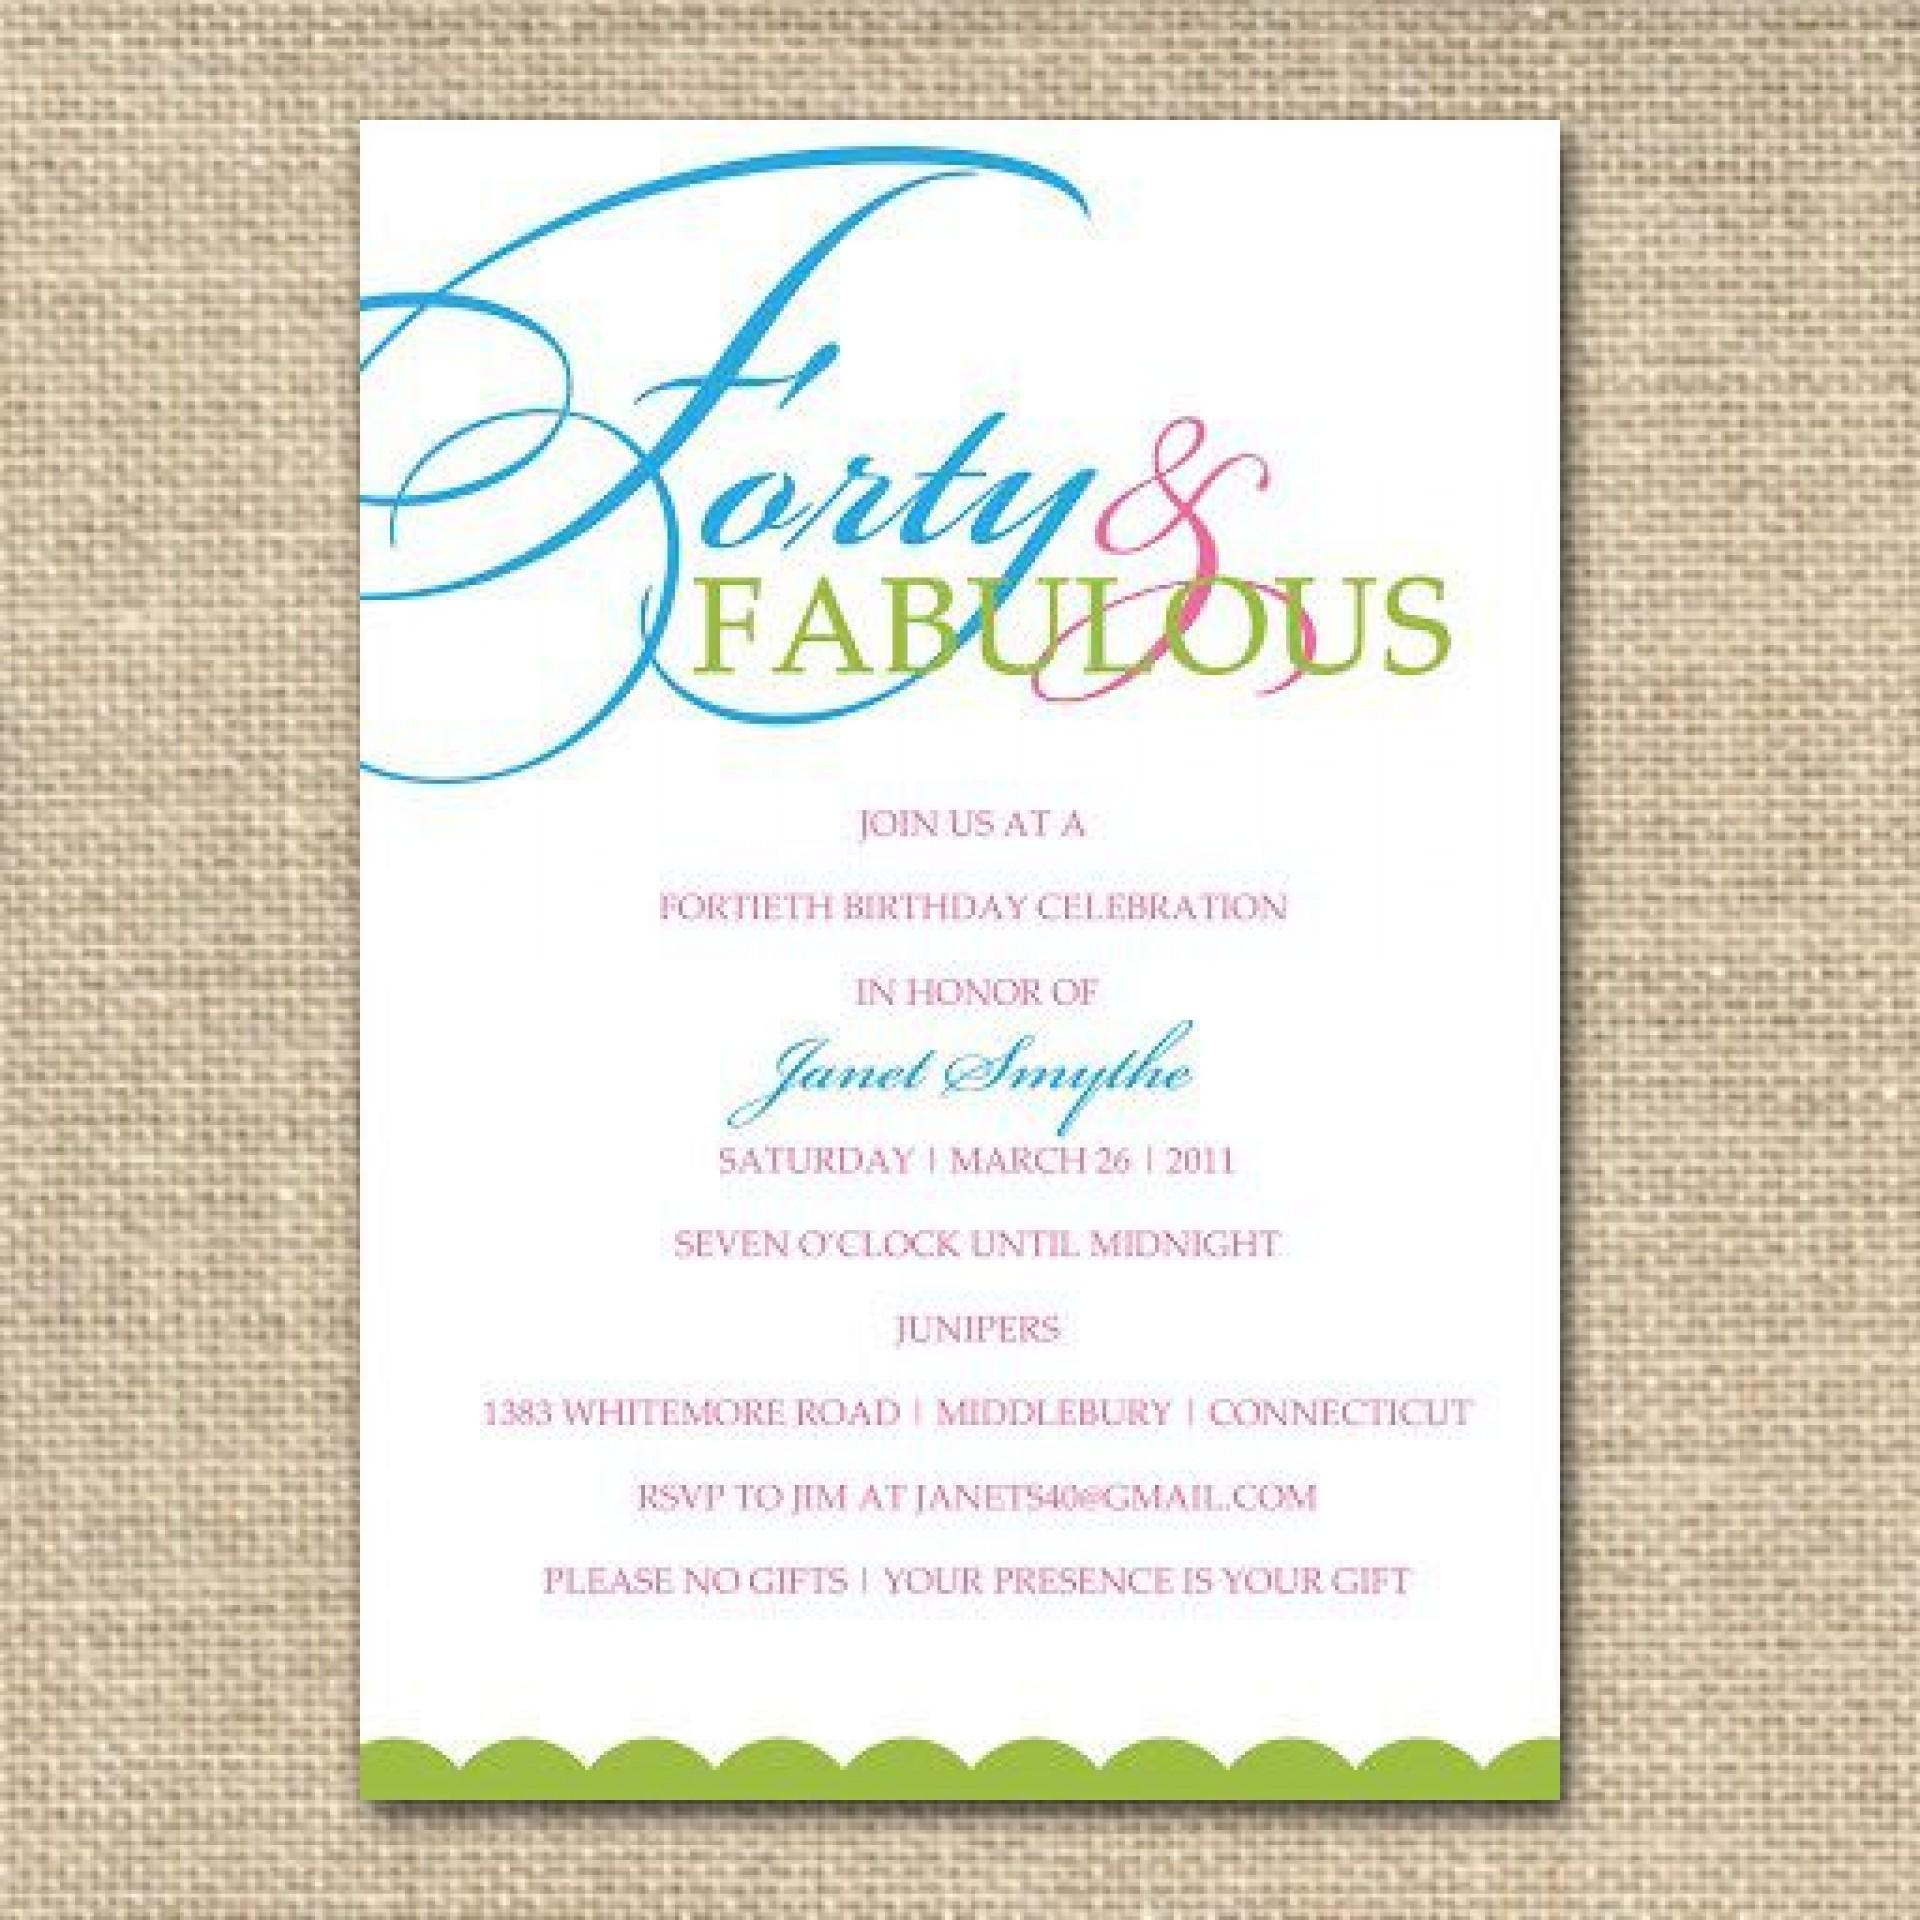 004 Frightening Birthday Invitation Wording Example Highest Clarity  Examples Party Invite Brunch Idea1920